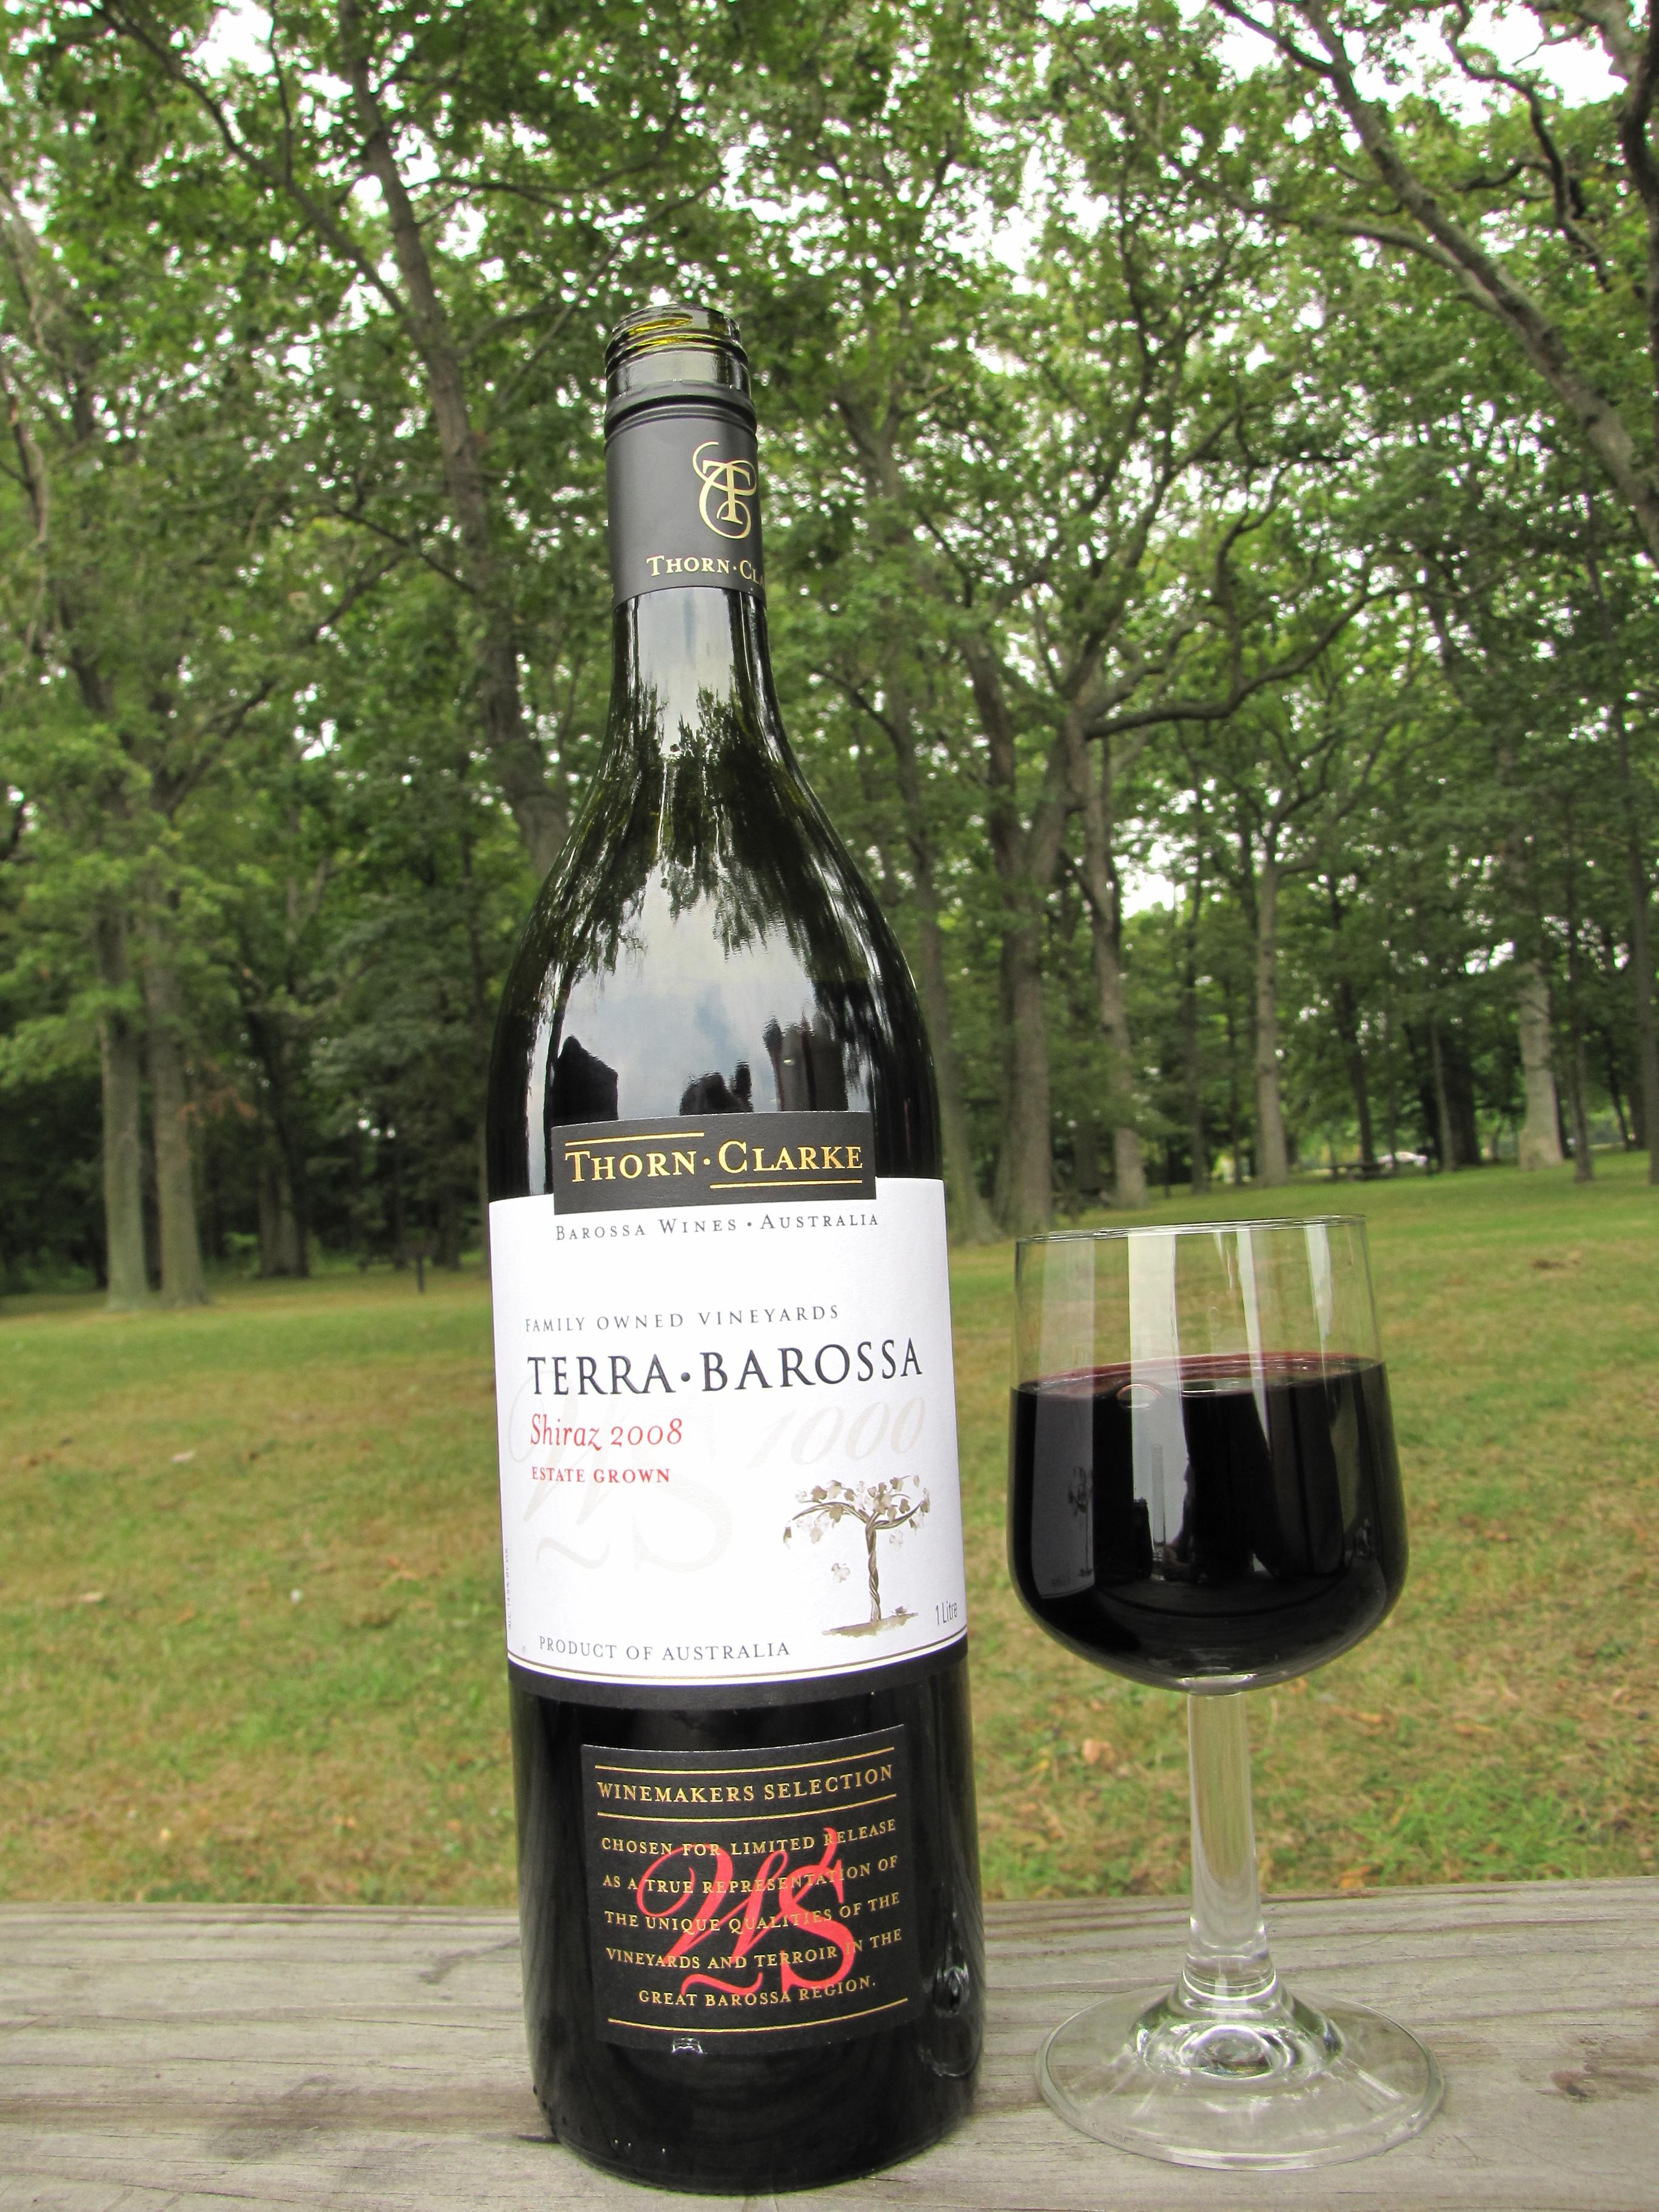 Thorn-Clarke Shiraz Terra Barossa (2008)